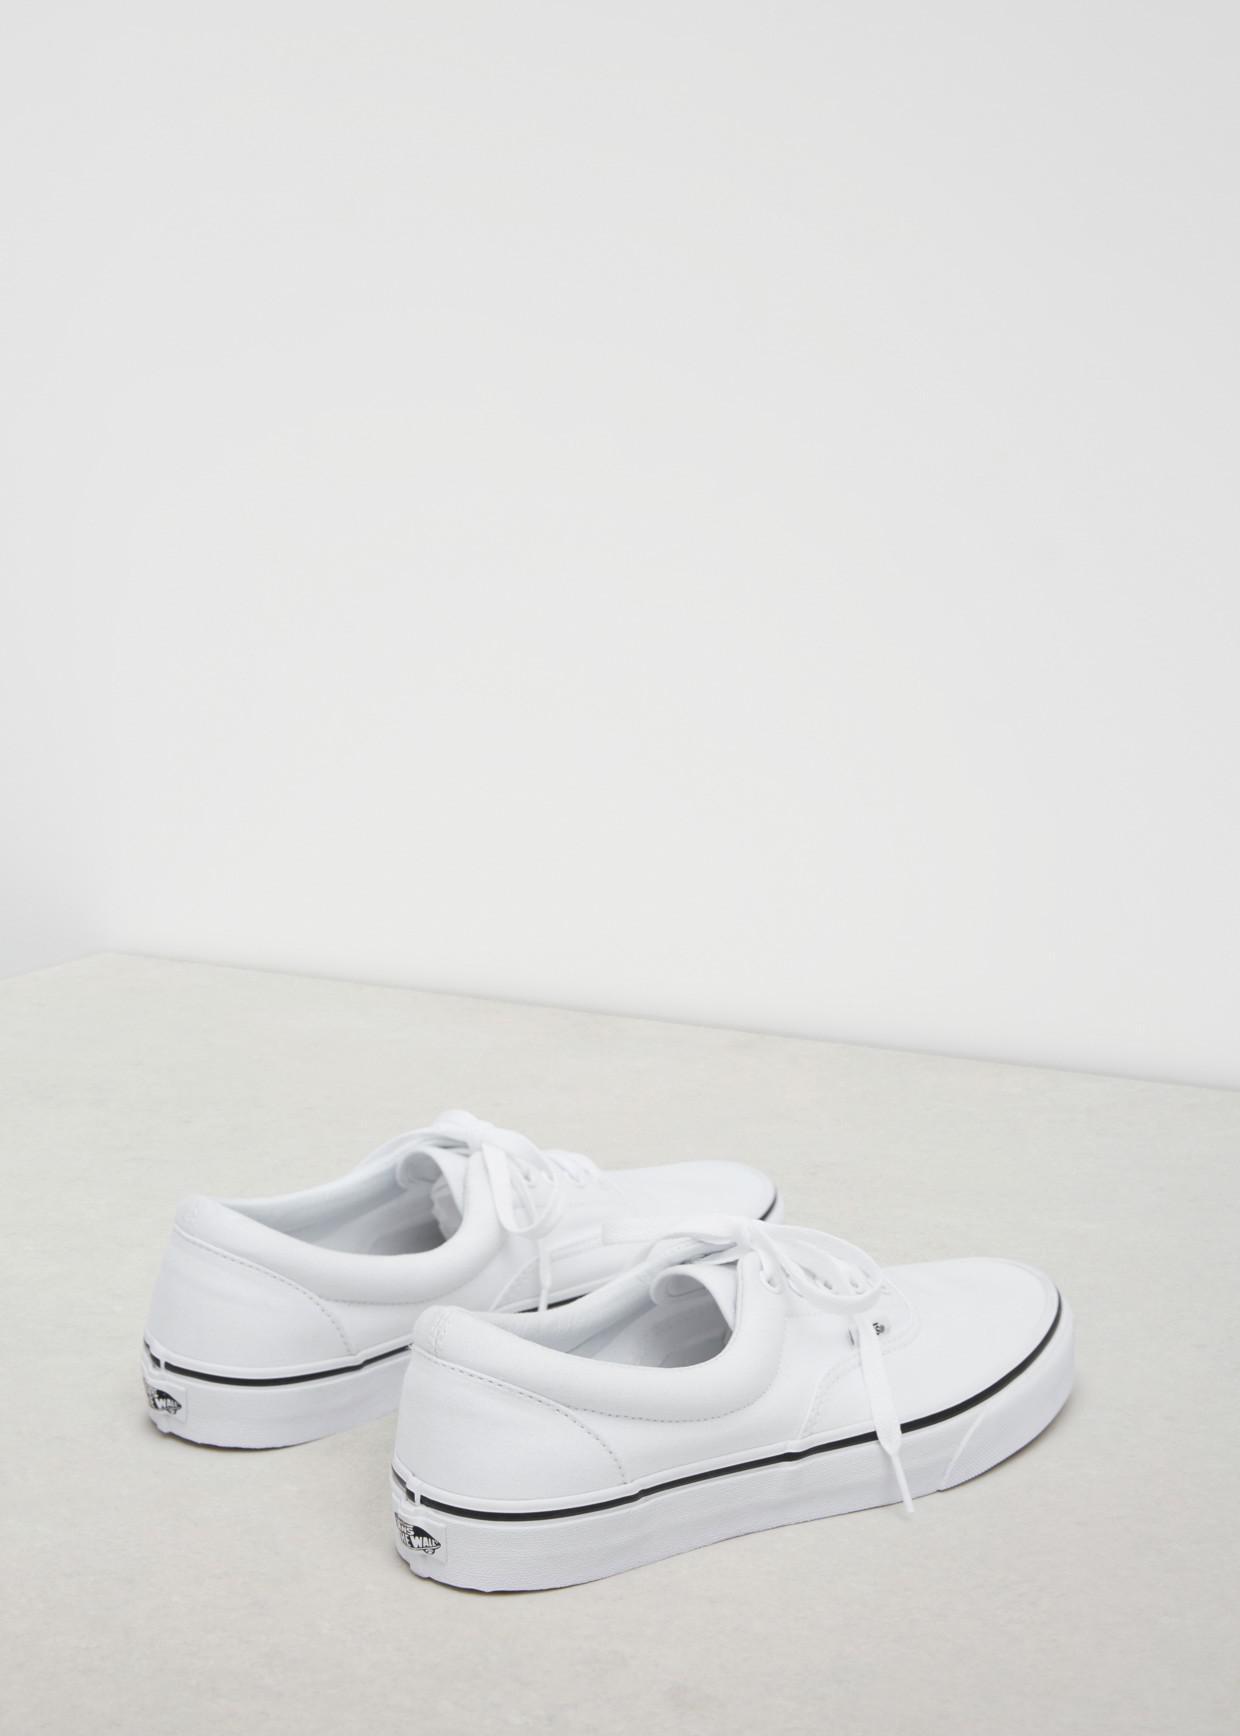 7c7a1b23ca2 Vans - True White Ua Era Sneaker for Men - Lyst. View fullscreen